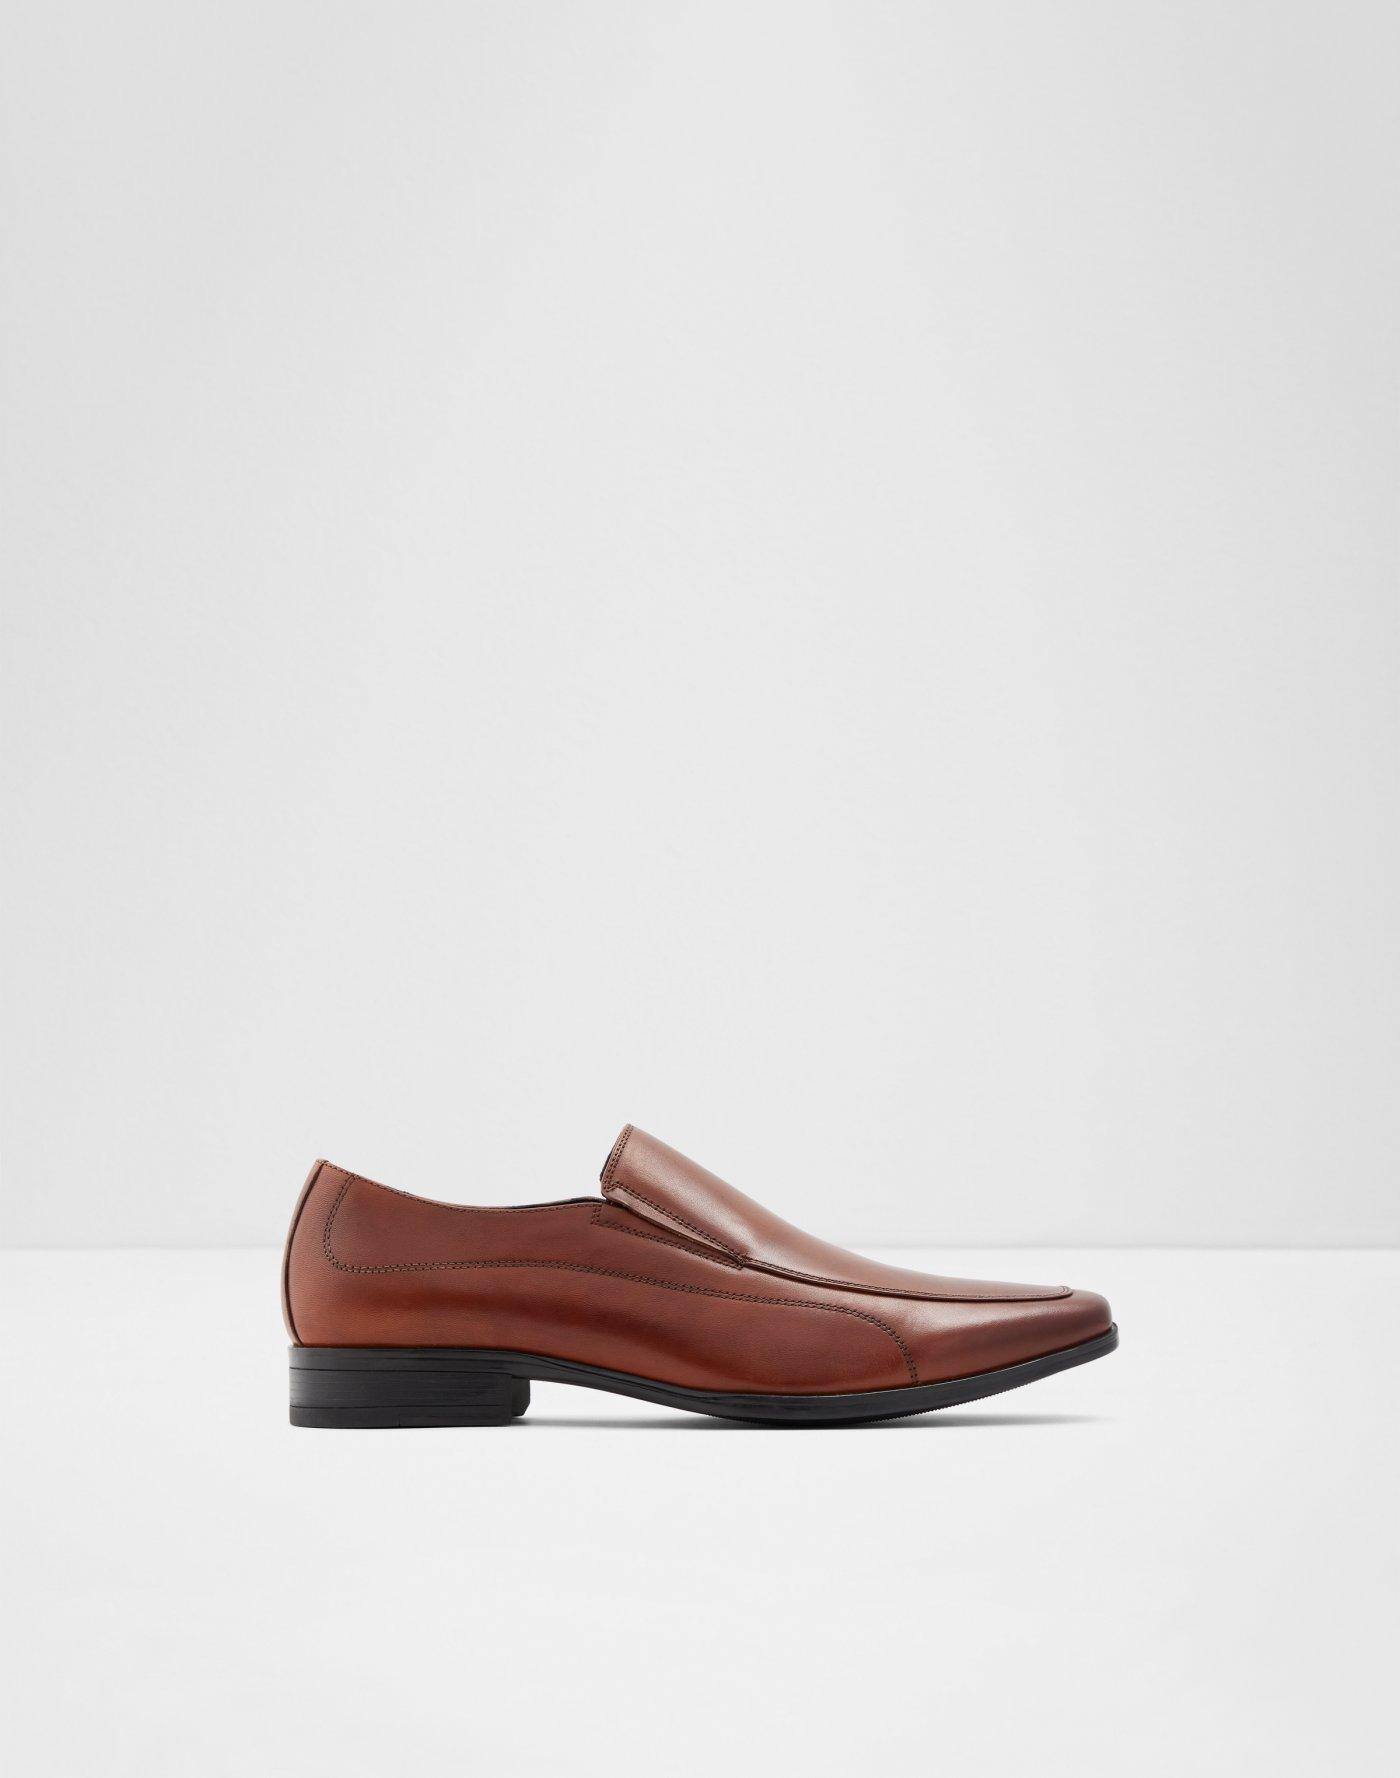 321d16890ff9f Men's Dress Shoes | Formal & Oxford Shoes For Men | ALDO US ...